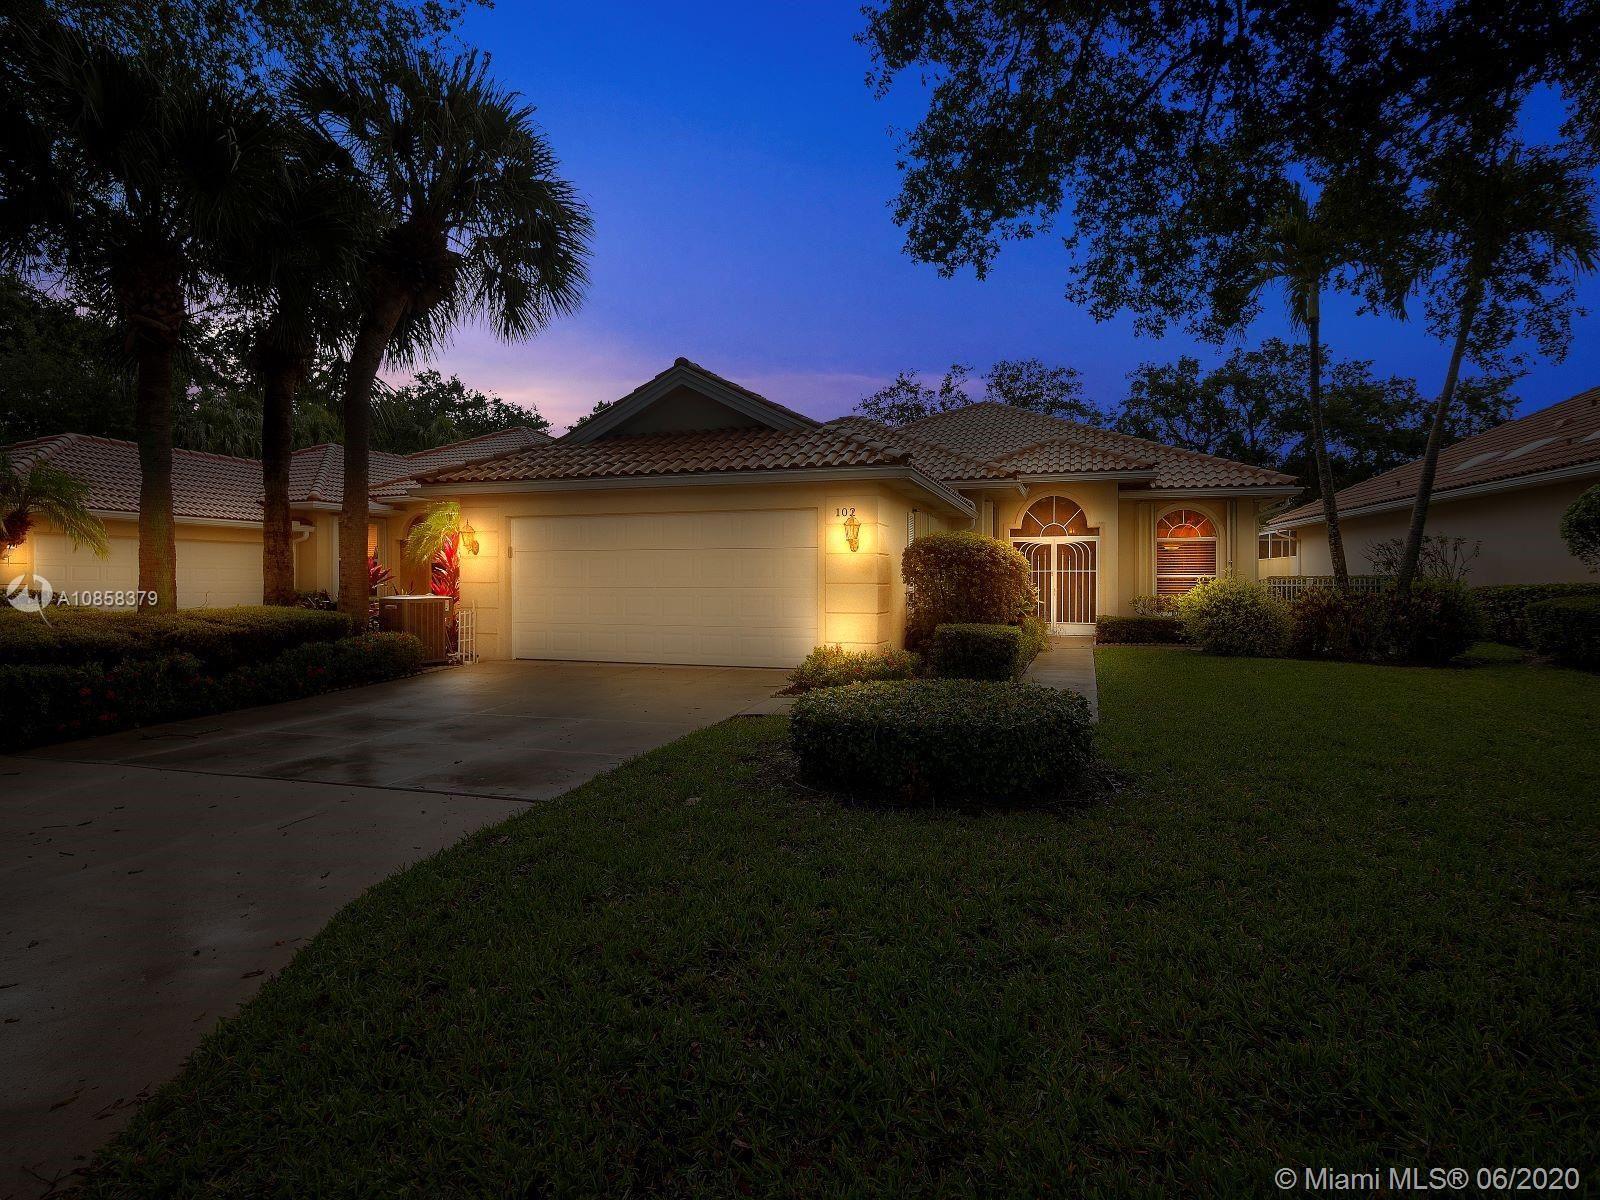 102 Winter Club Court, Palm Beach Gardens, FL 06810 - #: A10858379